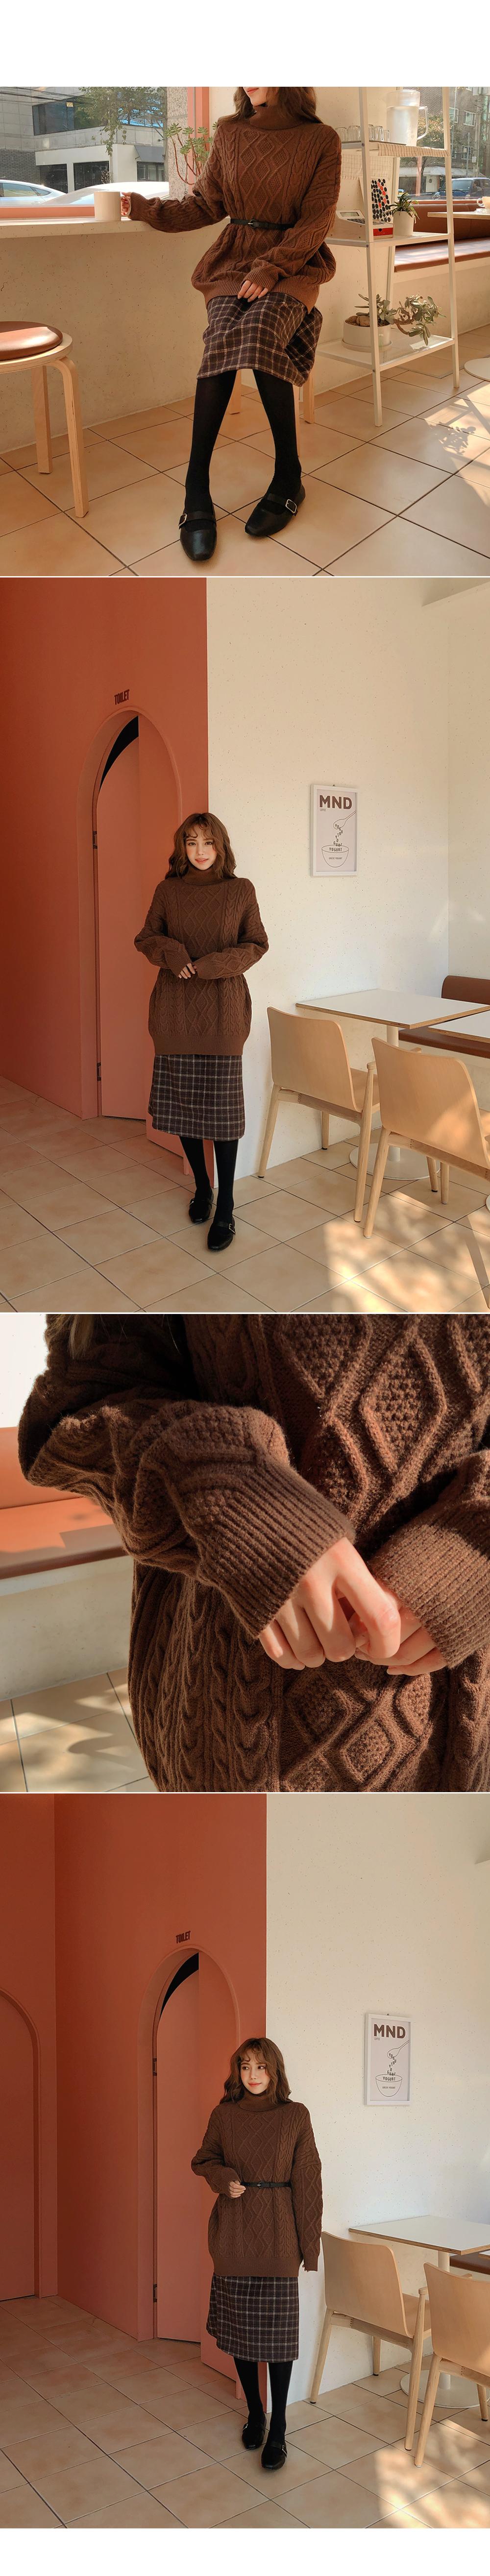 Daily dress check dress